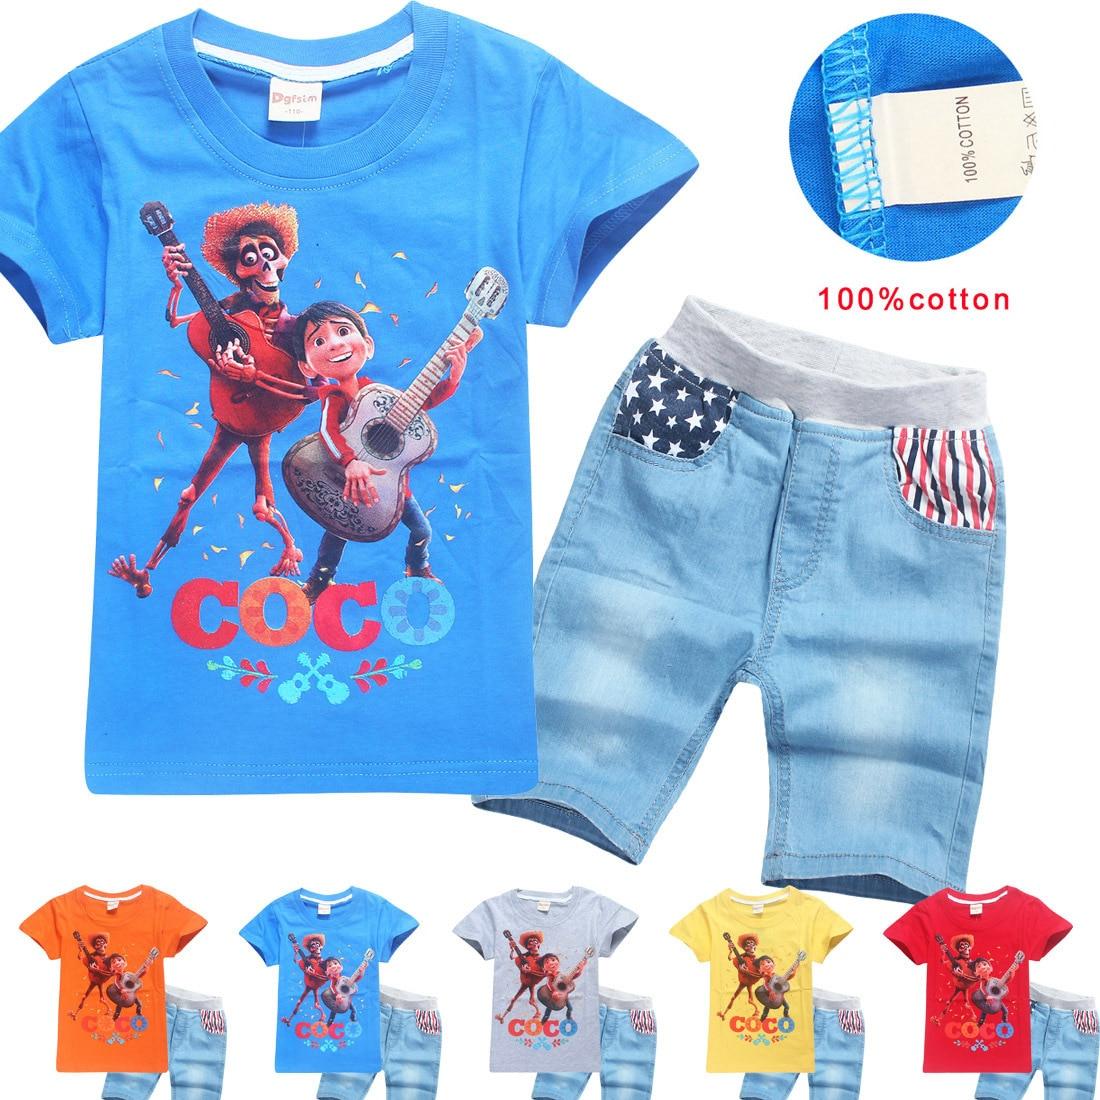 Children's Clothes 2018 New Summer Cartoon Coco T Shirts + Pants 2pcs Kids Boys Girls Top Tees Child T-shirts Boys Clothing Set music hall new 6h3n vacuum tube preamplifier hifi buffer pre amp matisse circuit